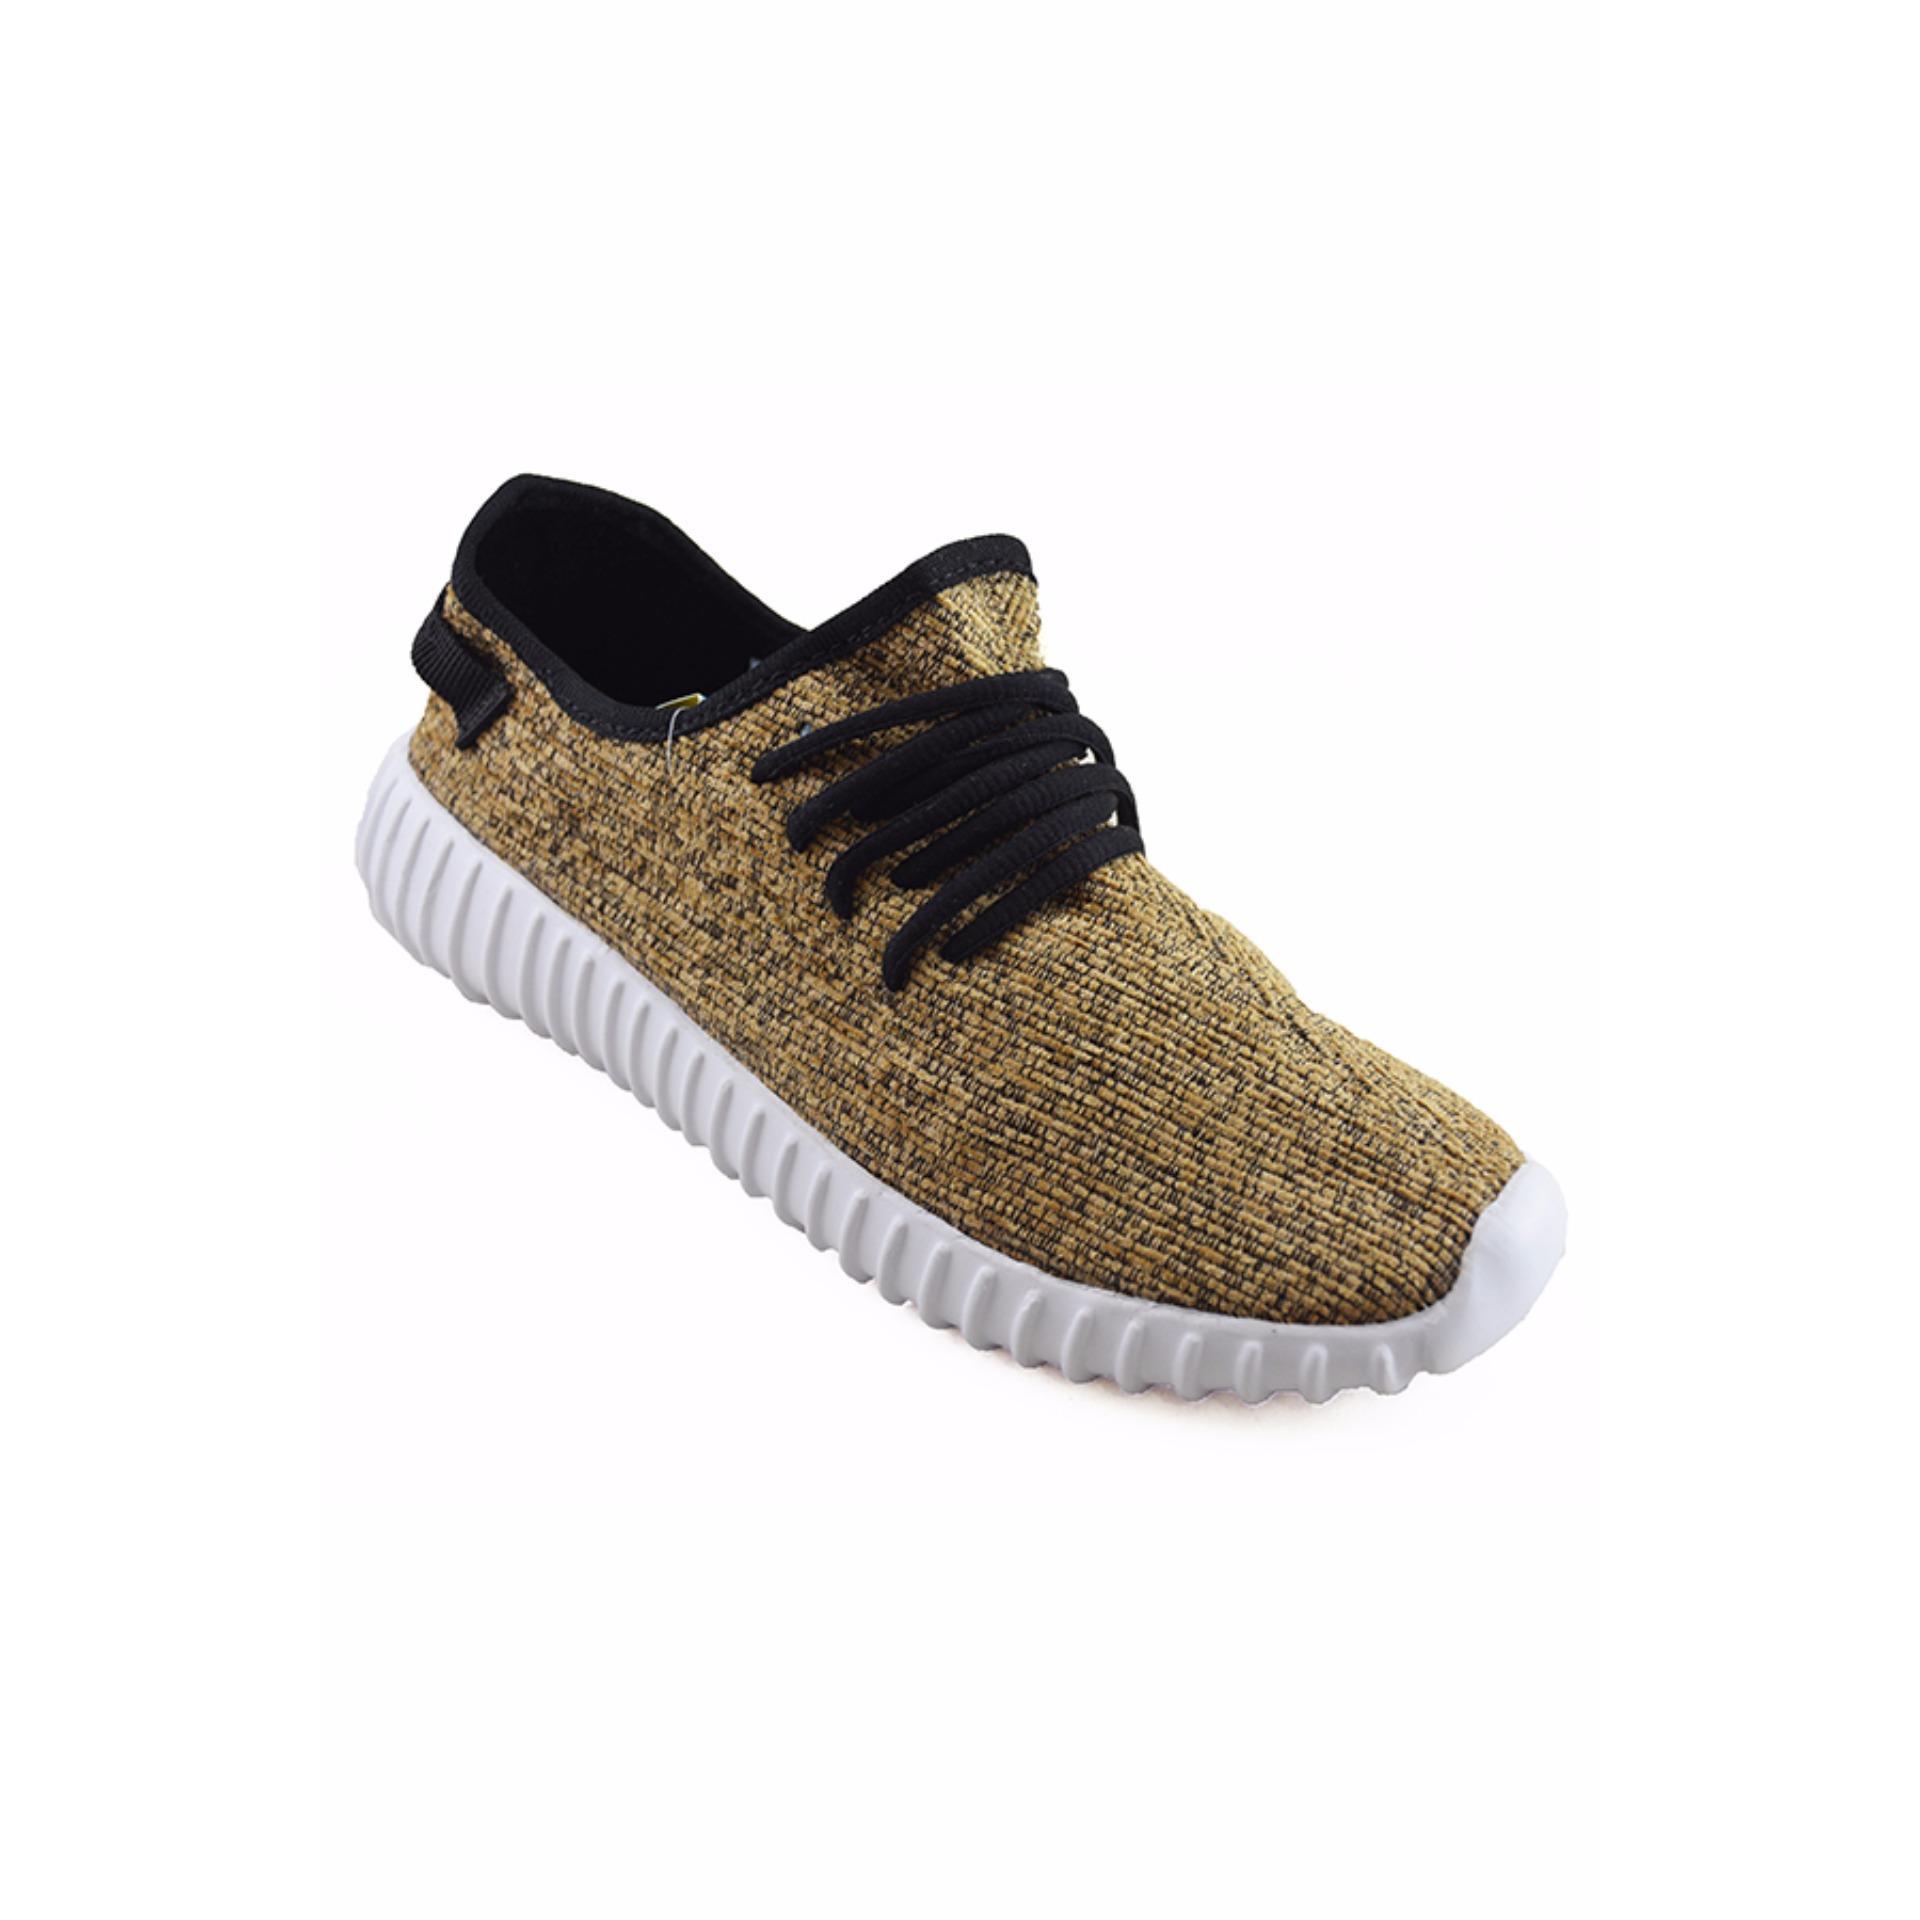 Gadis Manis Flats Sepatu Loafers Ukuran 21 . Source · Bendera anak S . Source ·